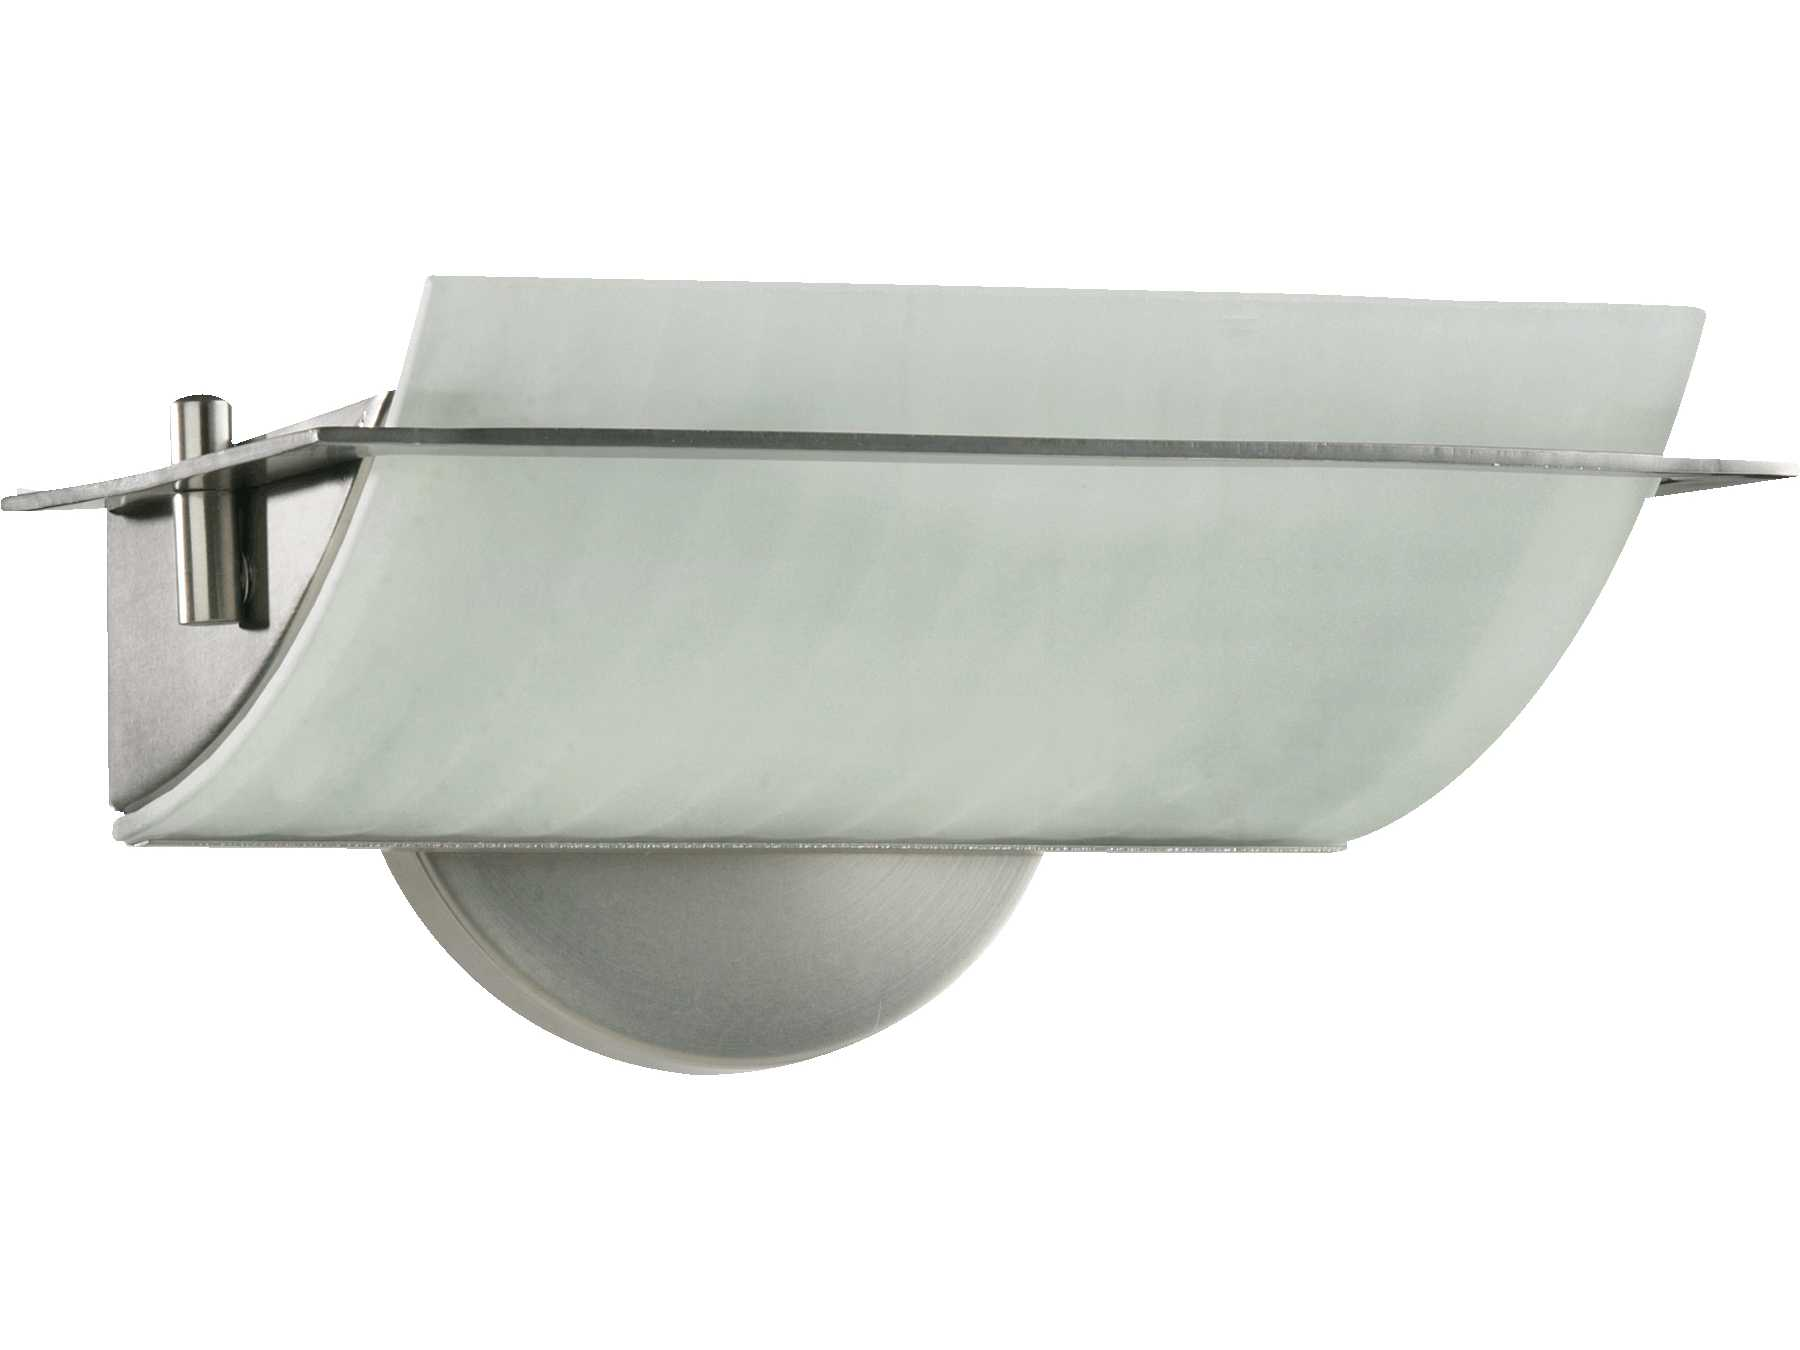 Quorum international satin nickel wall sconce qm578465 for International decor wall lights